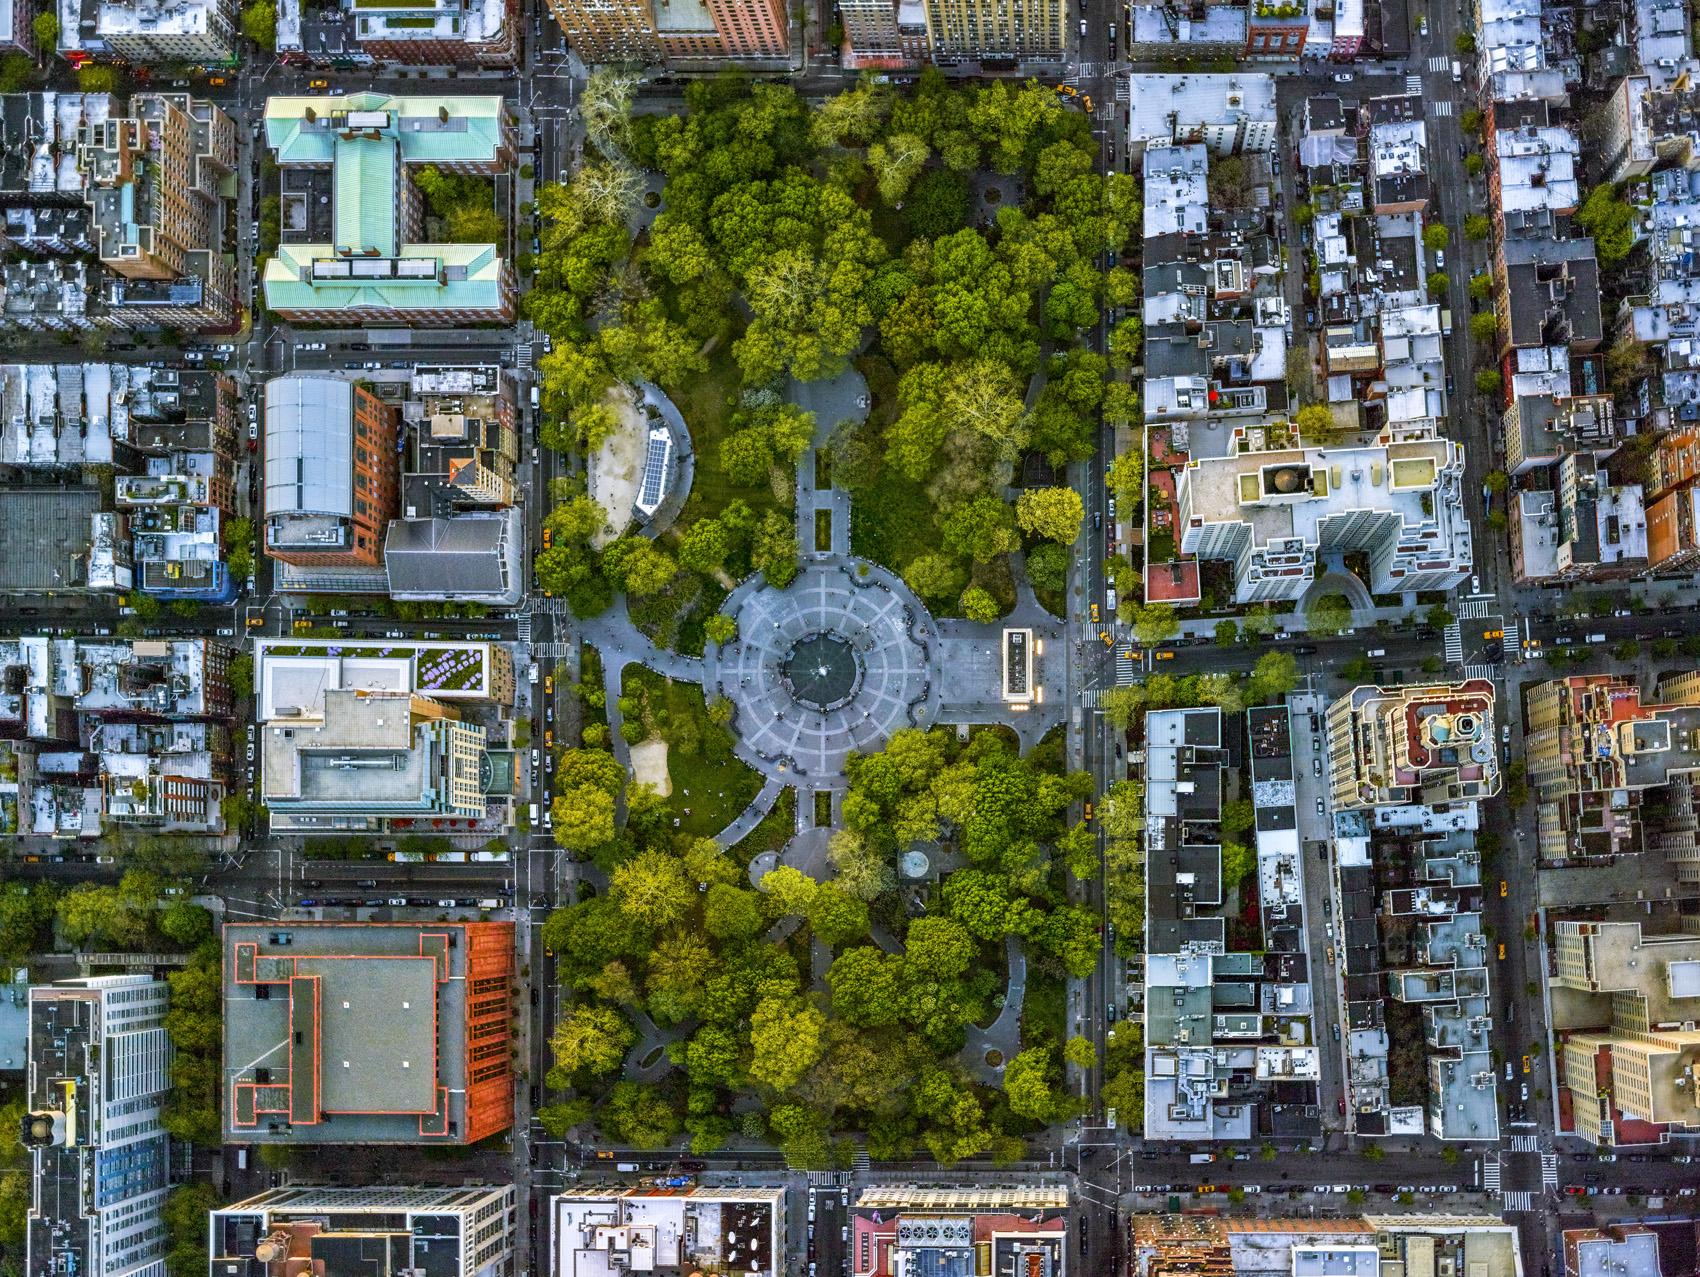 Washington Square Park, LA NY. Jeffrey Milstein © 2017